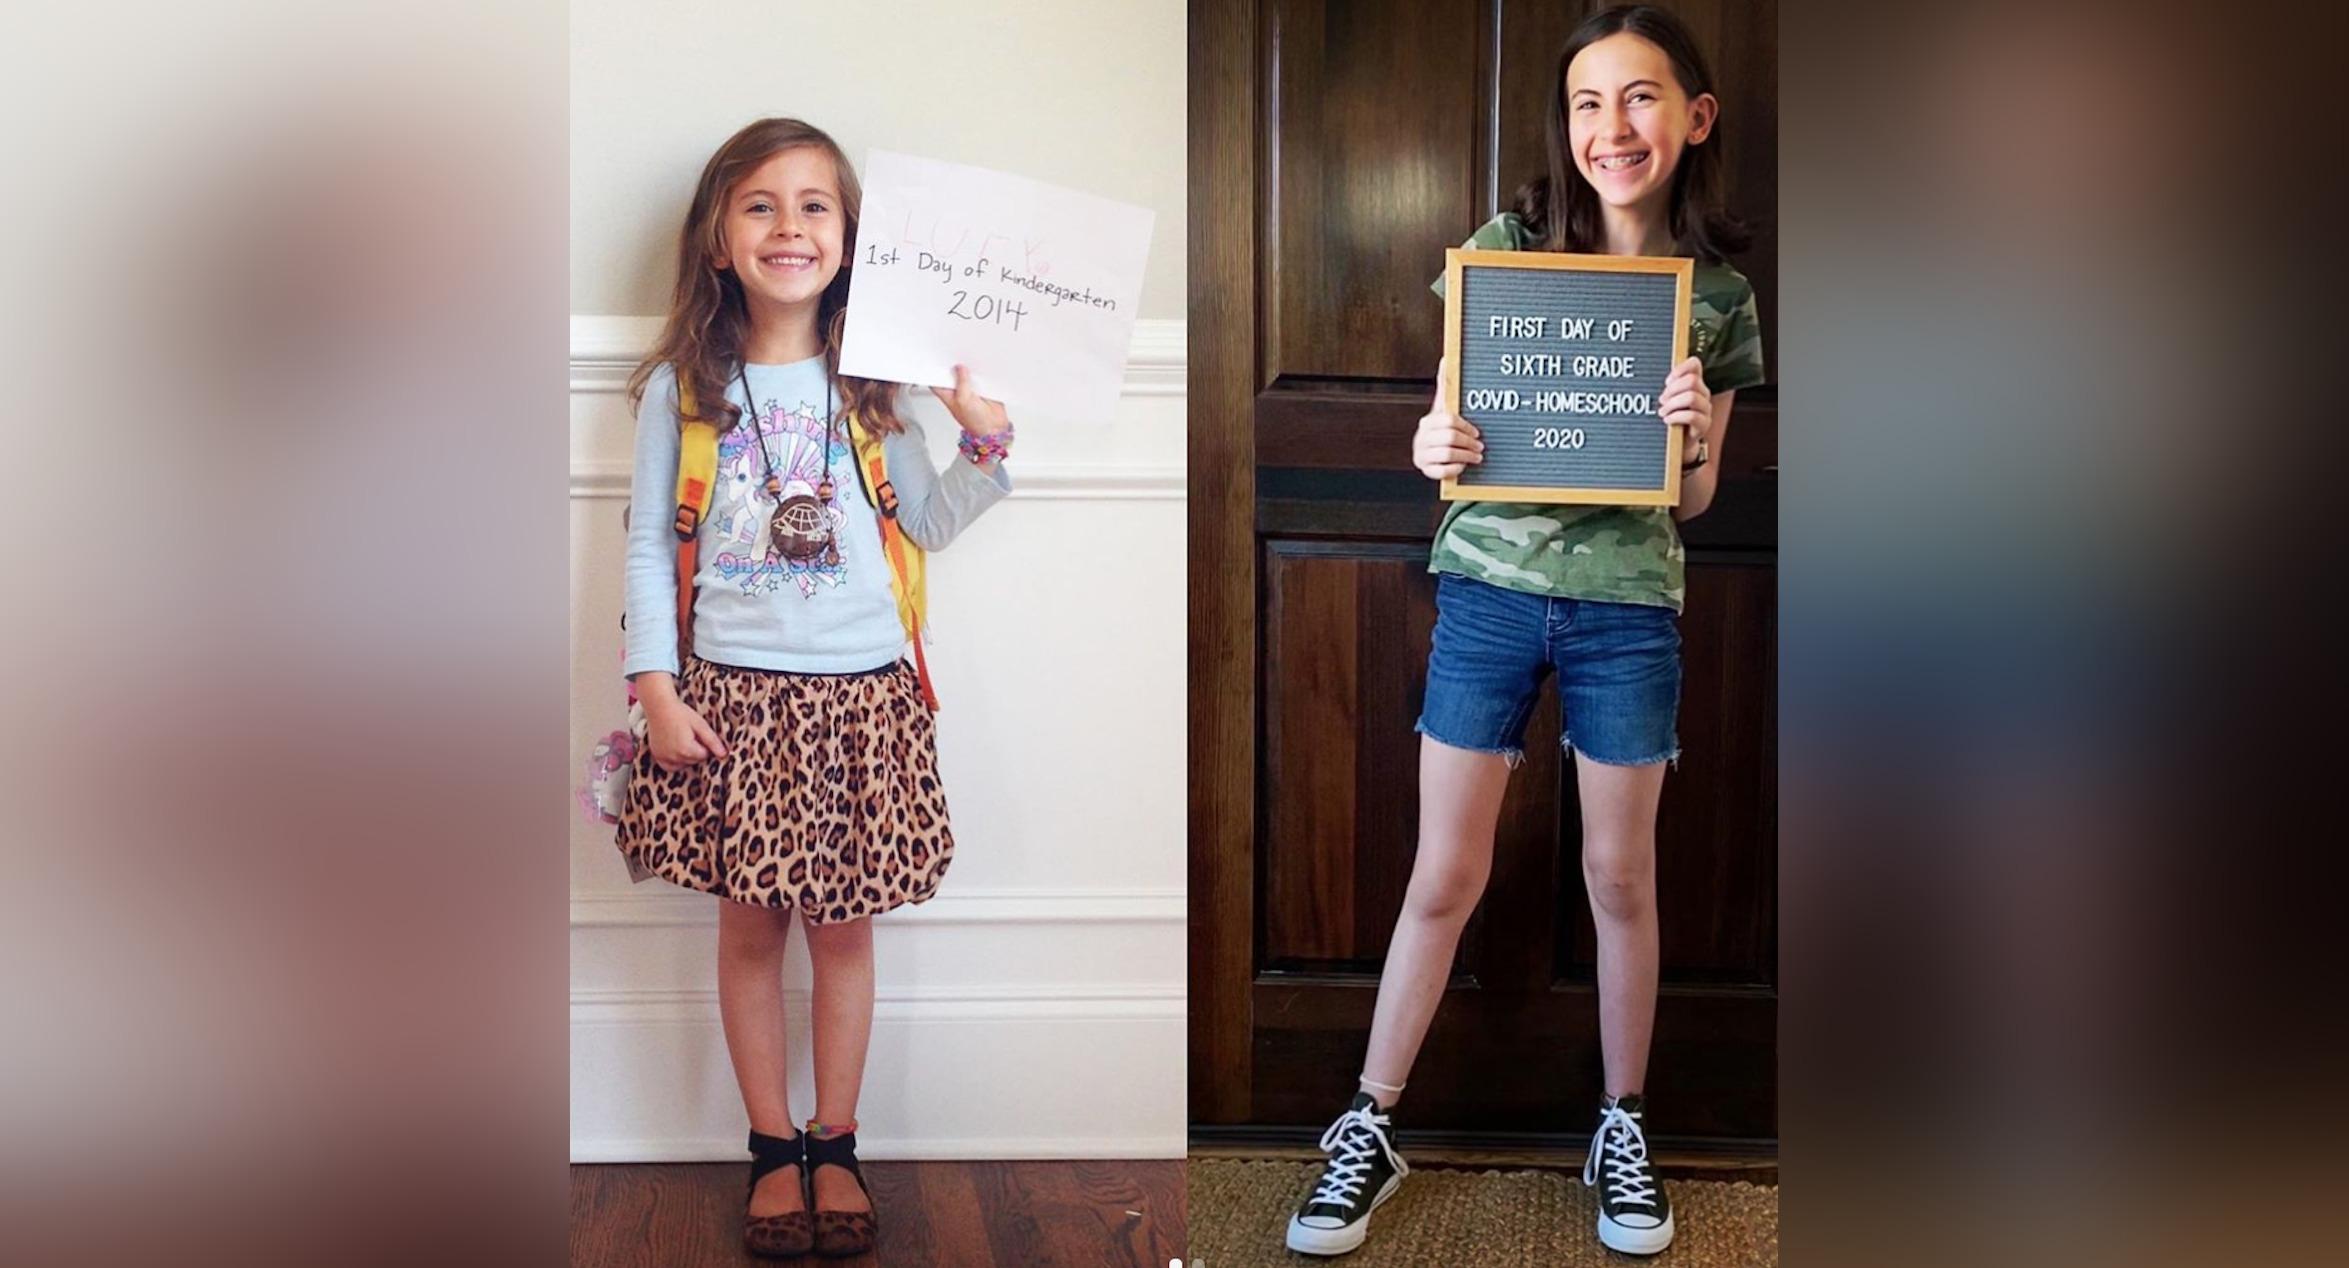 Side by side photo of kindergartener and middle schooler